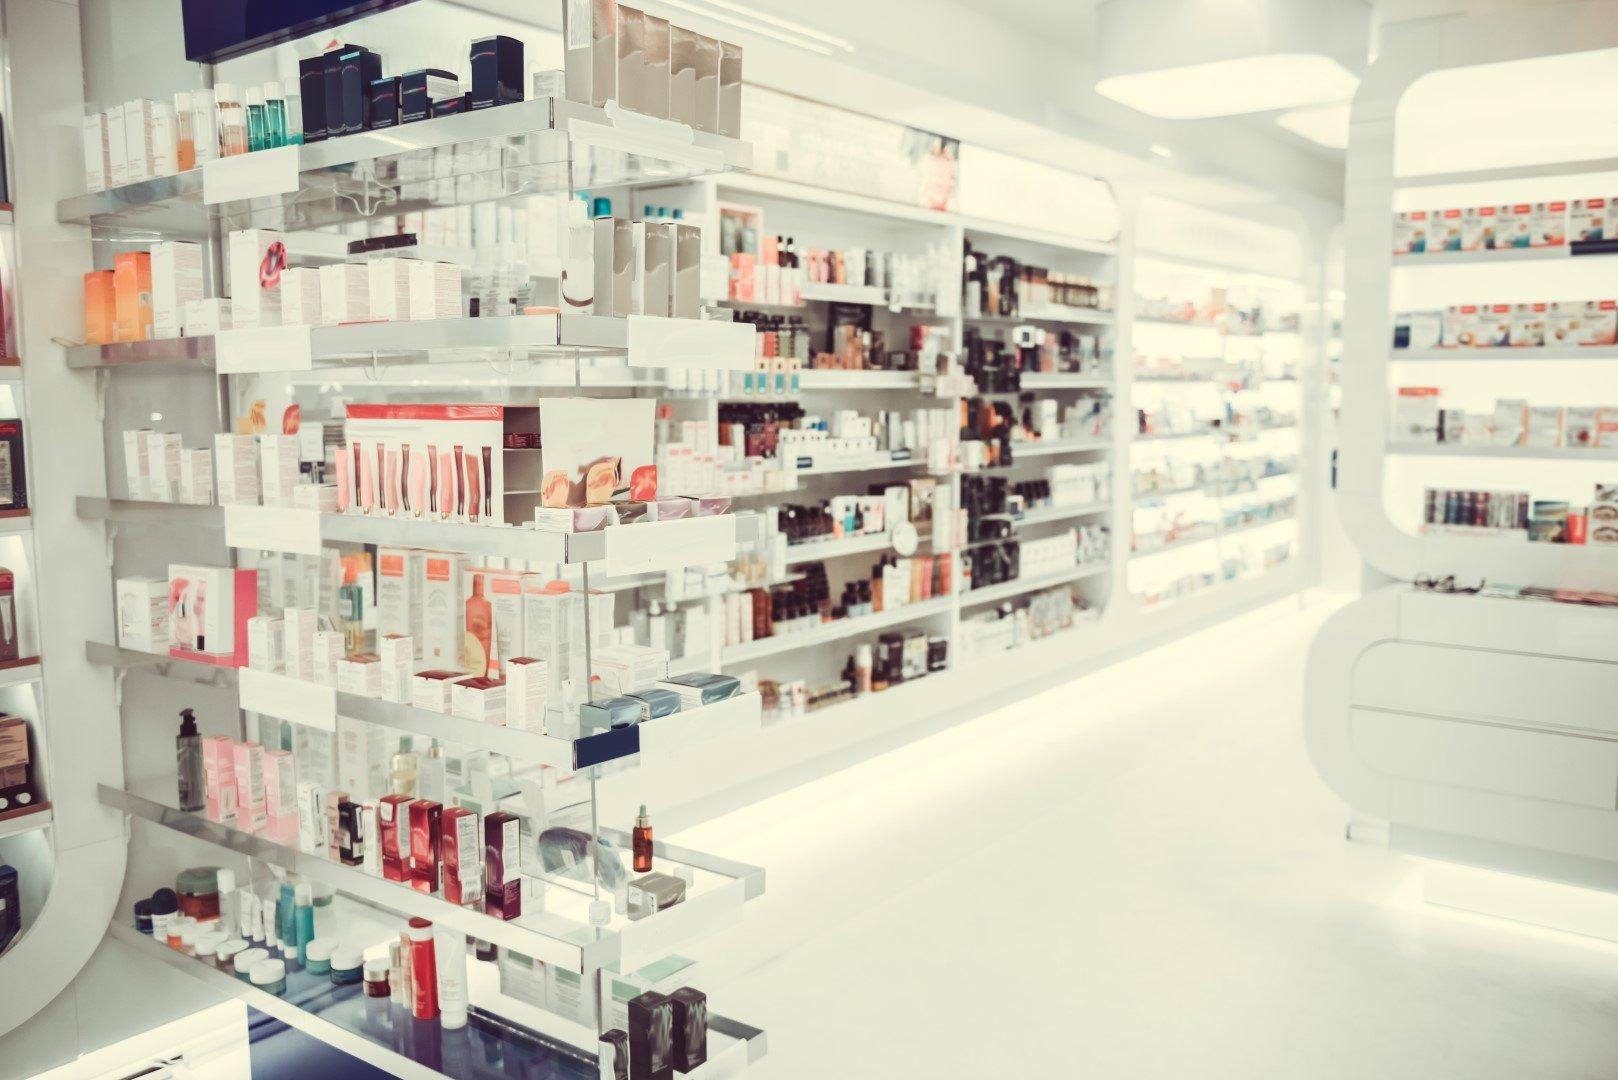 Arredo farmacie e parafarmacie genova abac arredamenti for Arredamento parafarmacia usato